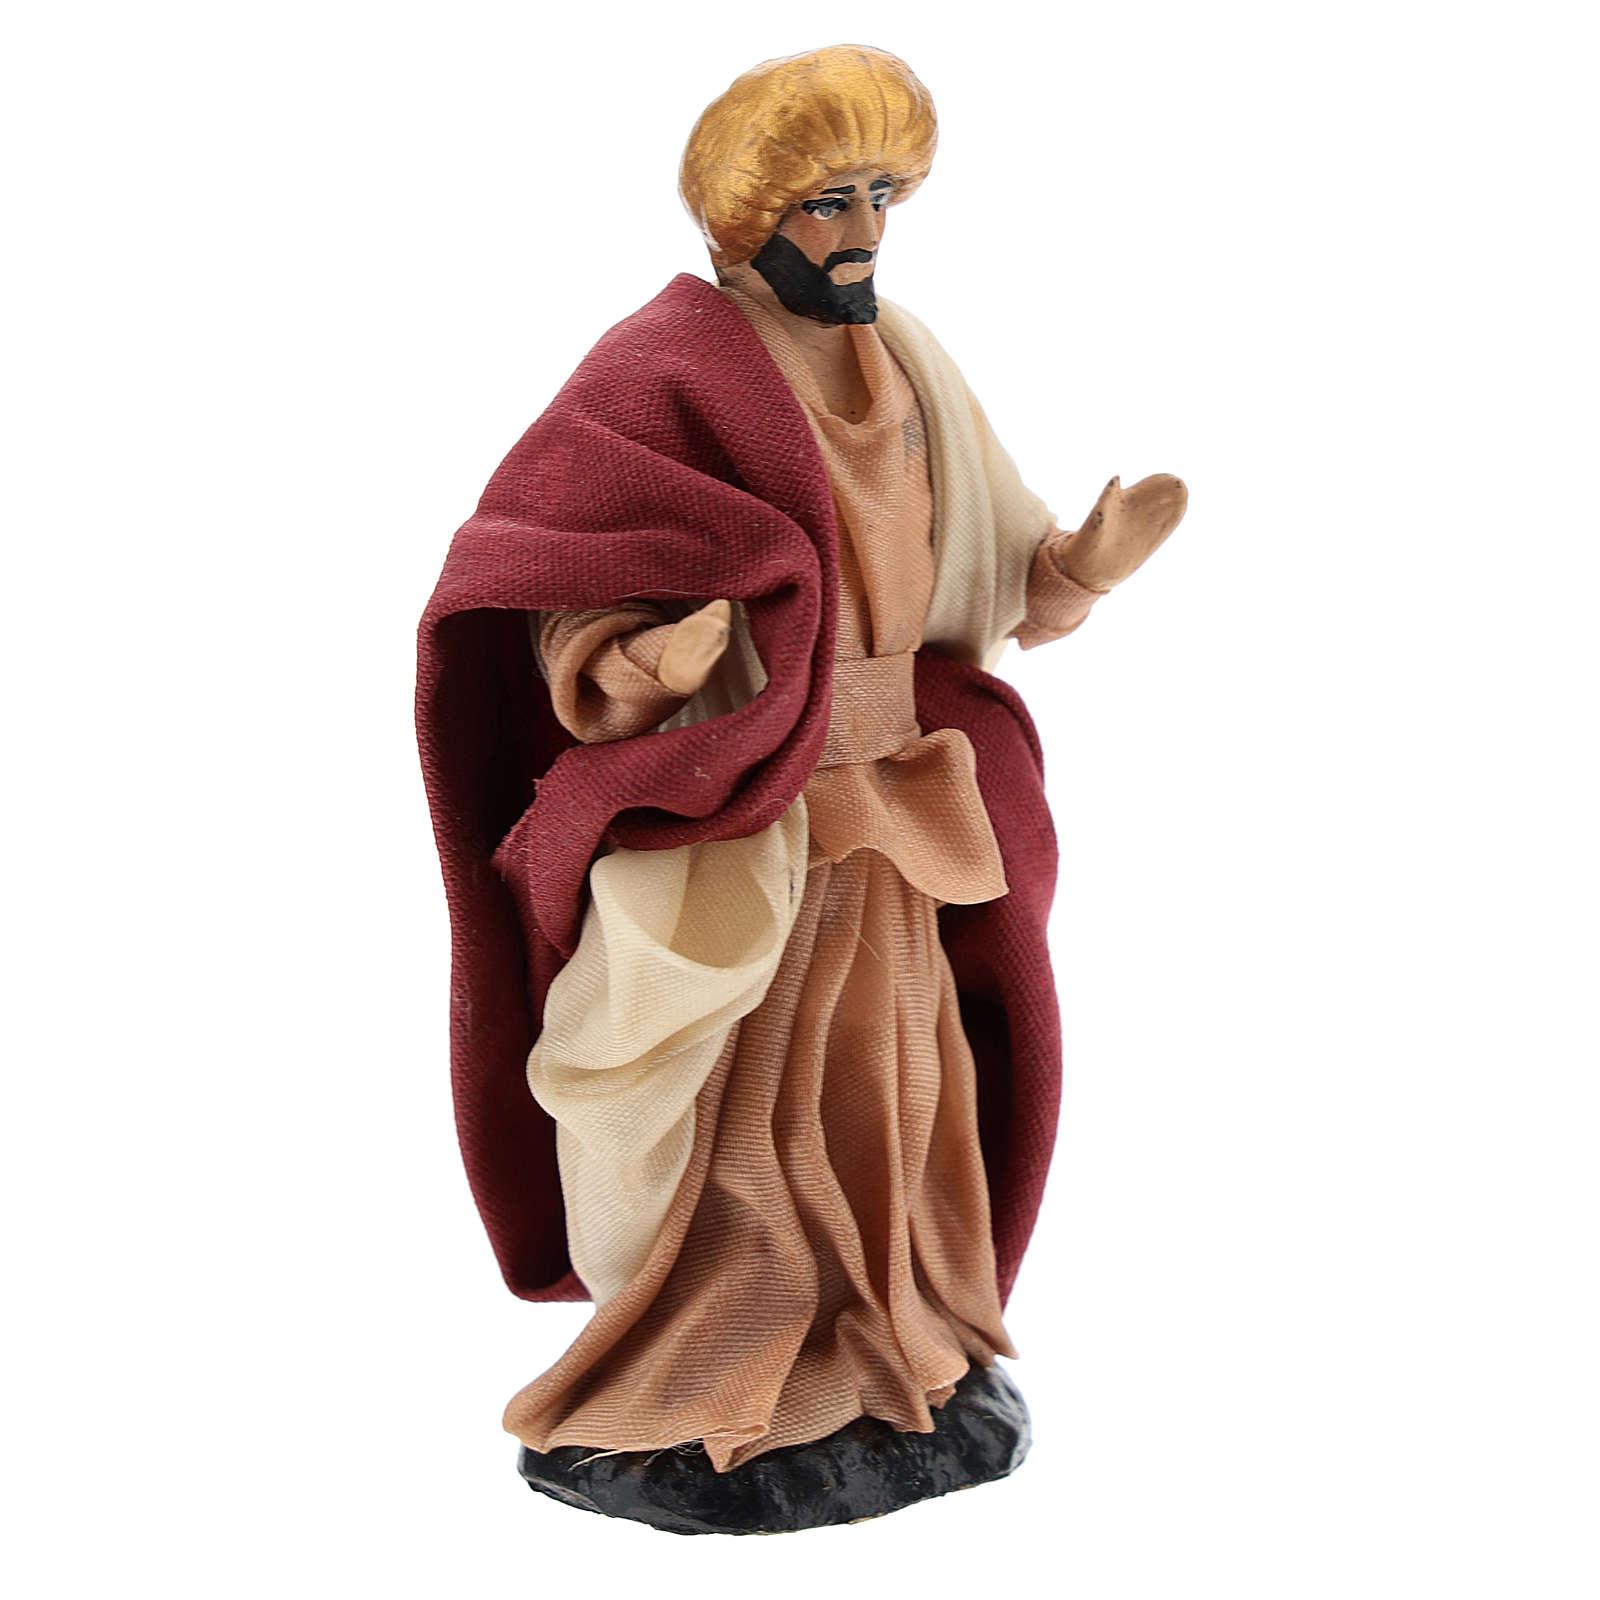 Neapolitan Nativity figurine, Man with turban 8cm 4